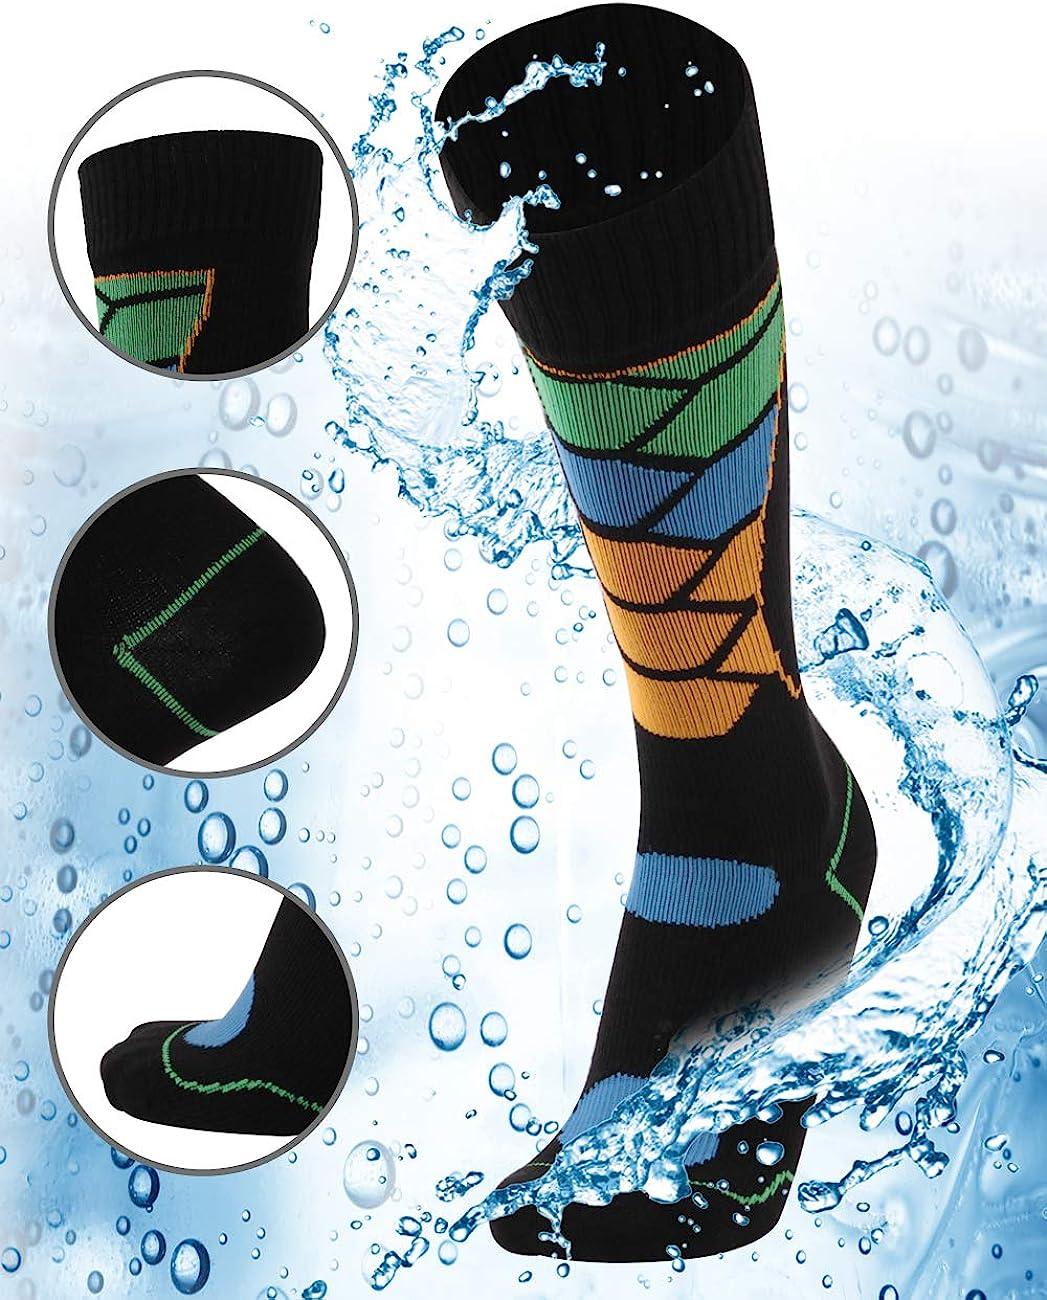 100% Waterproof Hiking Max 85% OFF Socks SGS RANDY Max 84% OFF SUN K Certified Unisex